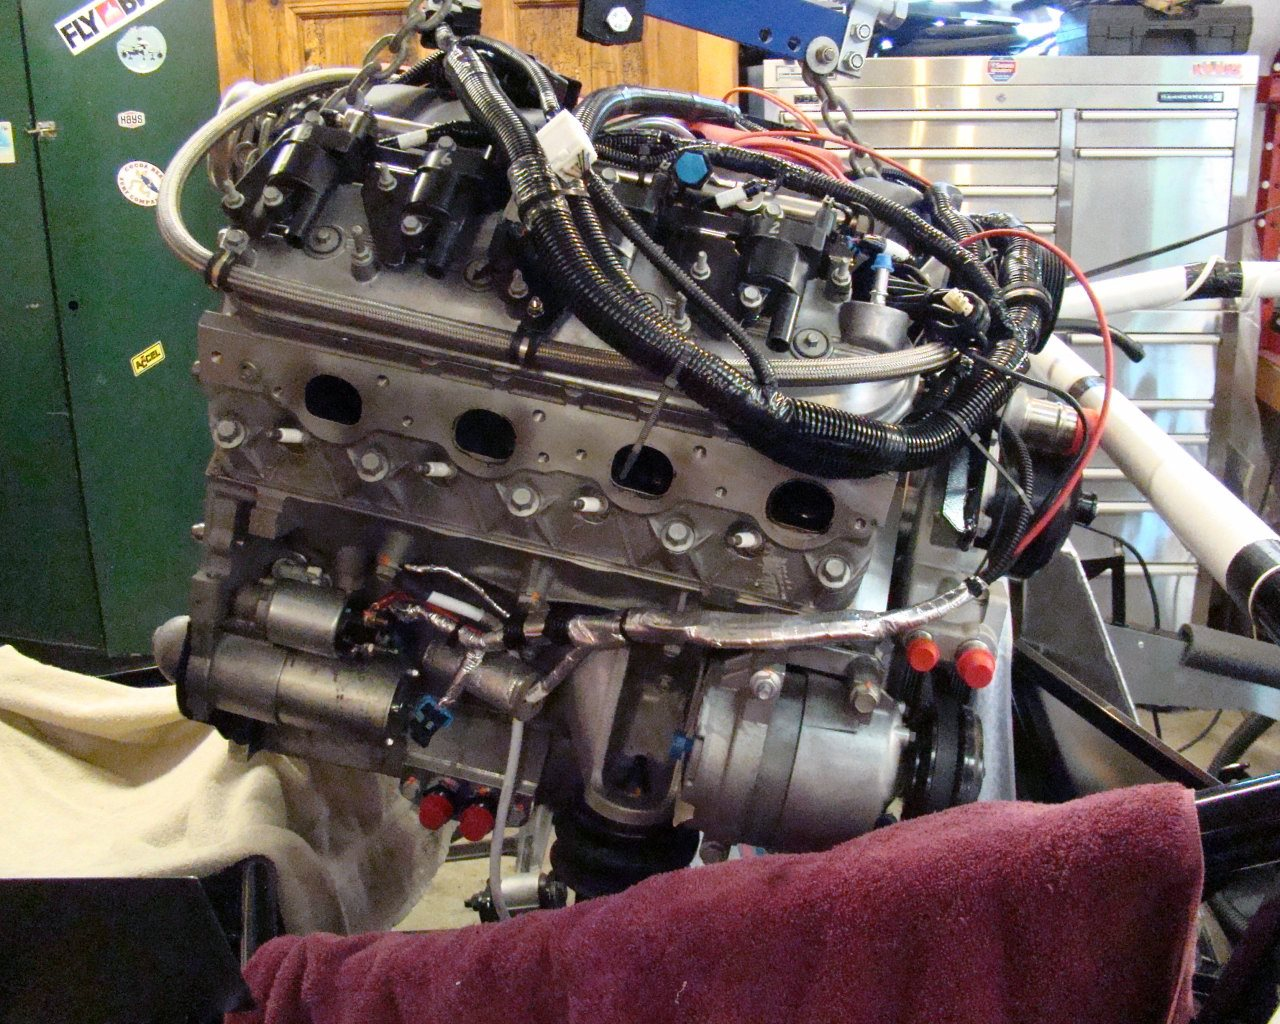 ENGINE DESCRIPTION AND MODS